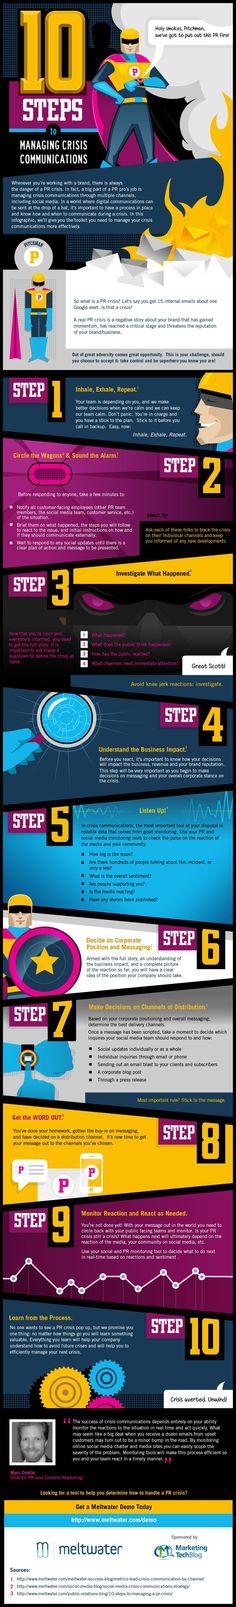 Infographic: 10 Step Crisis Communication Management